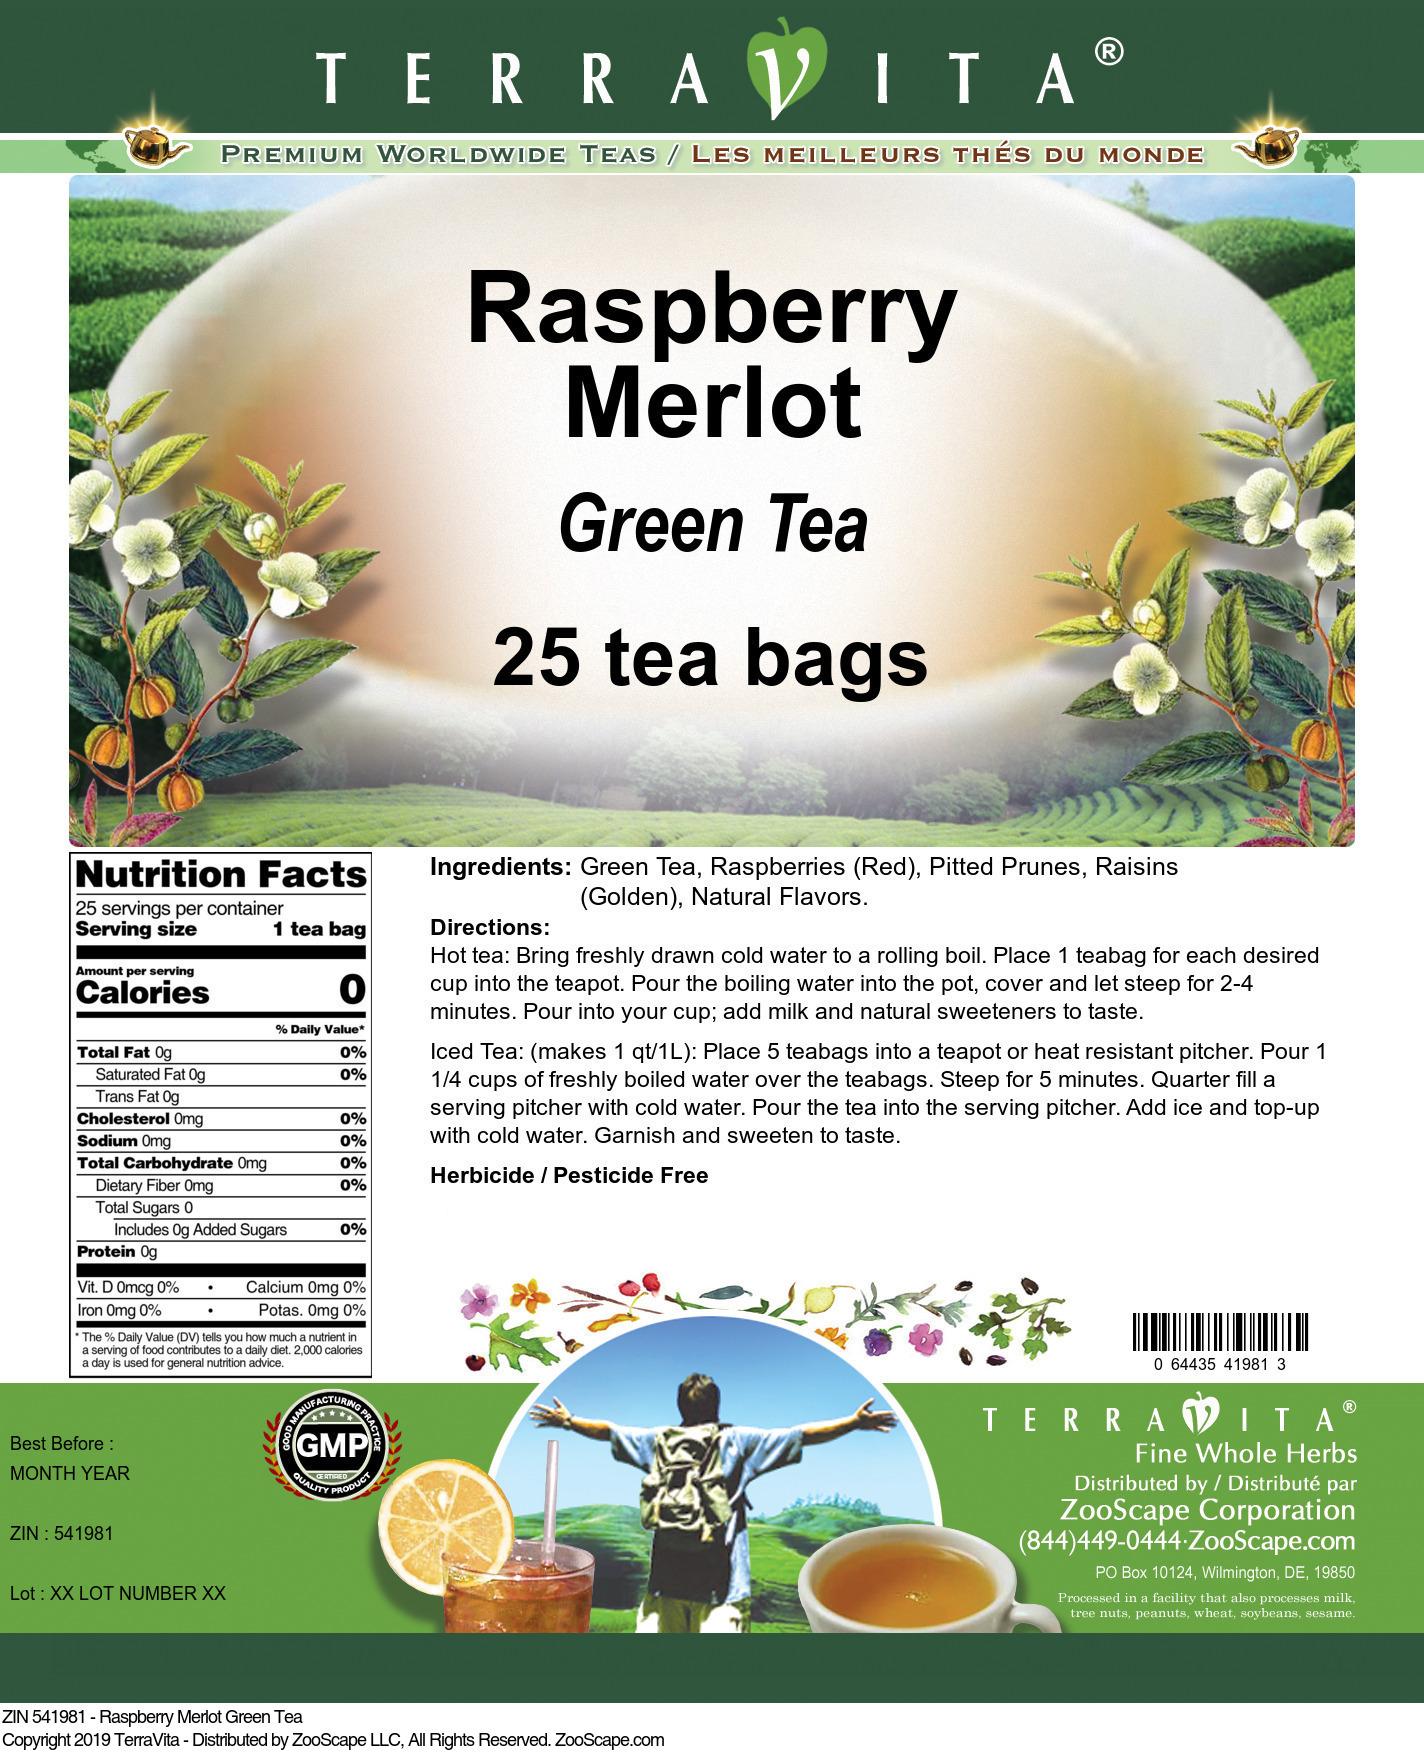 Raspberry Merlot Green Tea